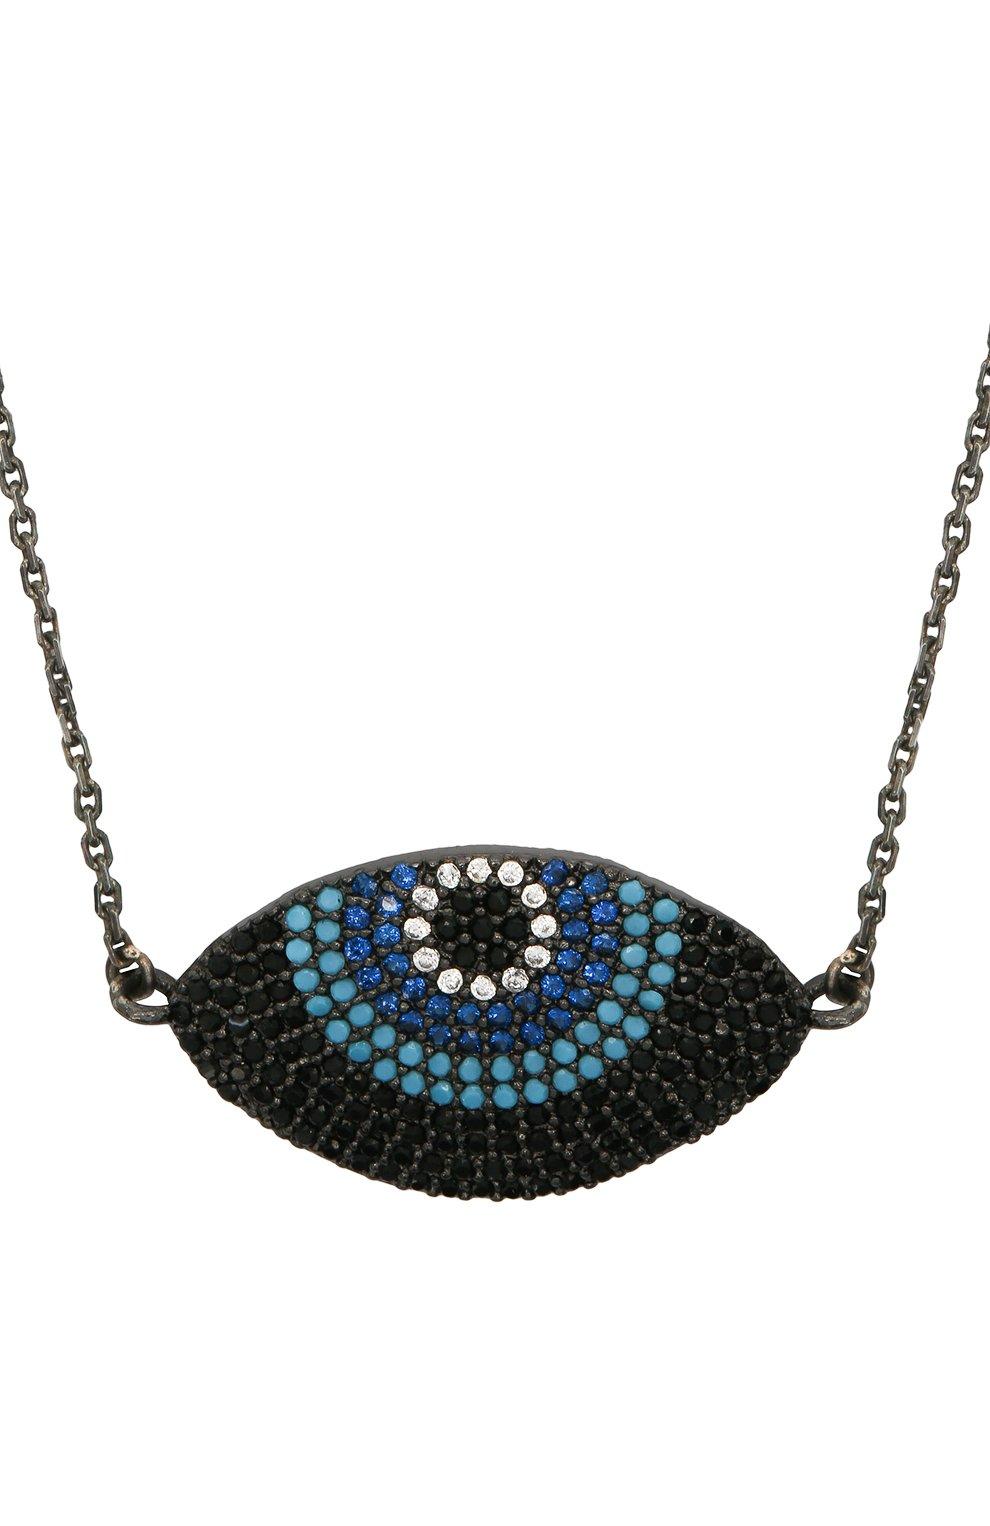 Женское колье глаз for fun DZHANELLI серебряного цвета, арт. 14738/090 | Фото 2 (Материал: Серебро)